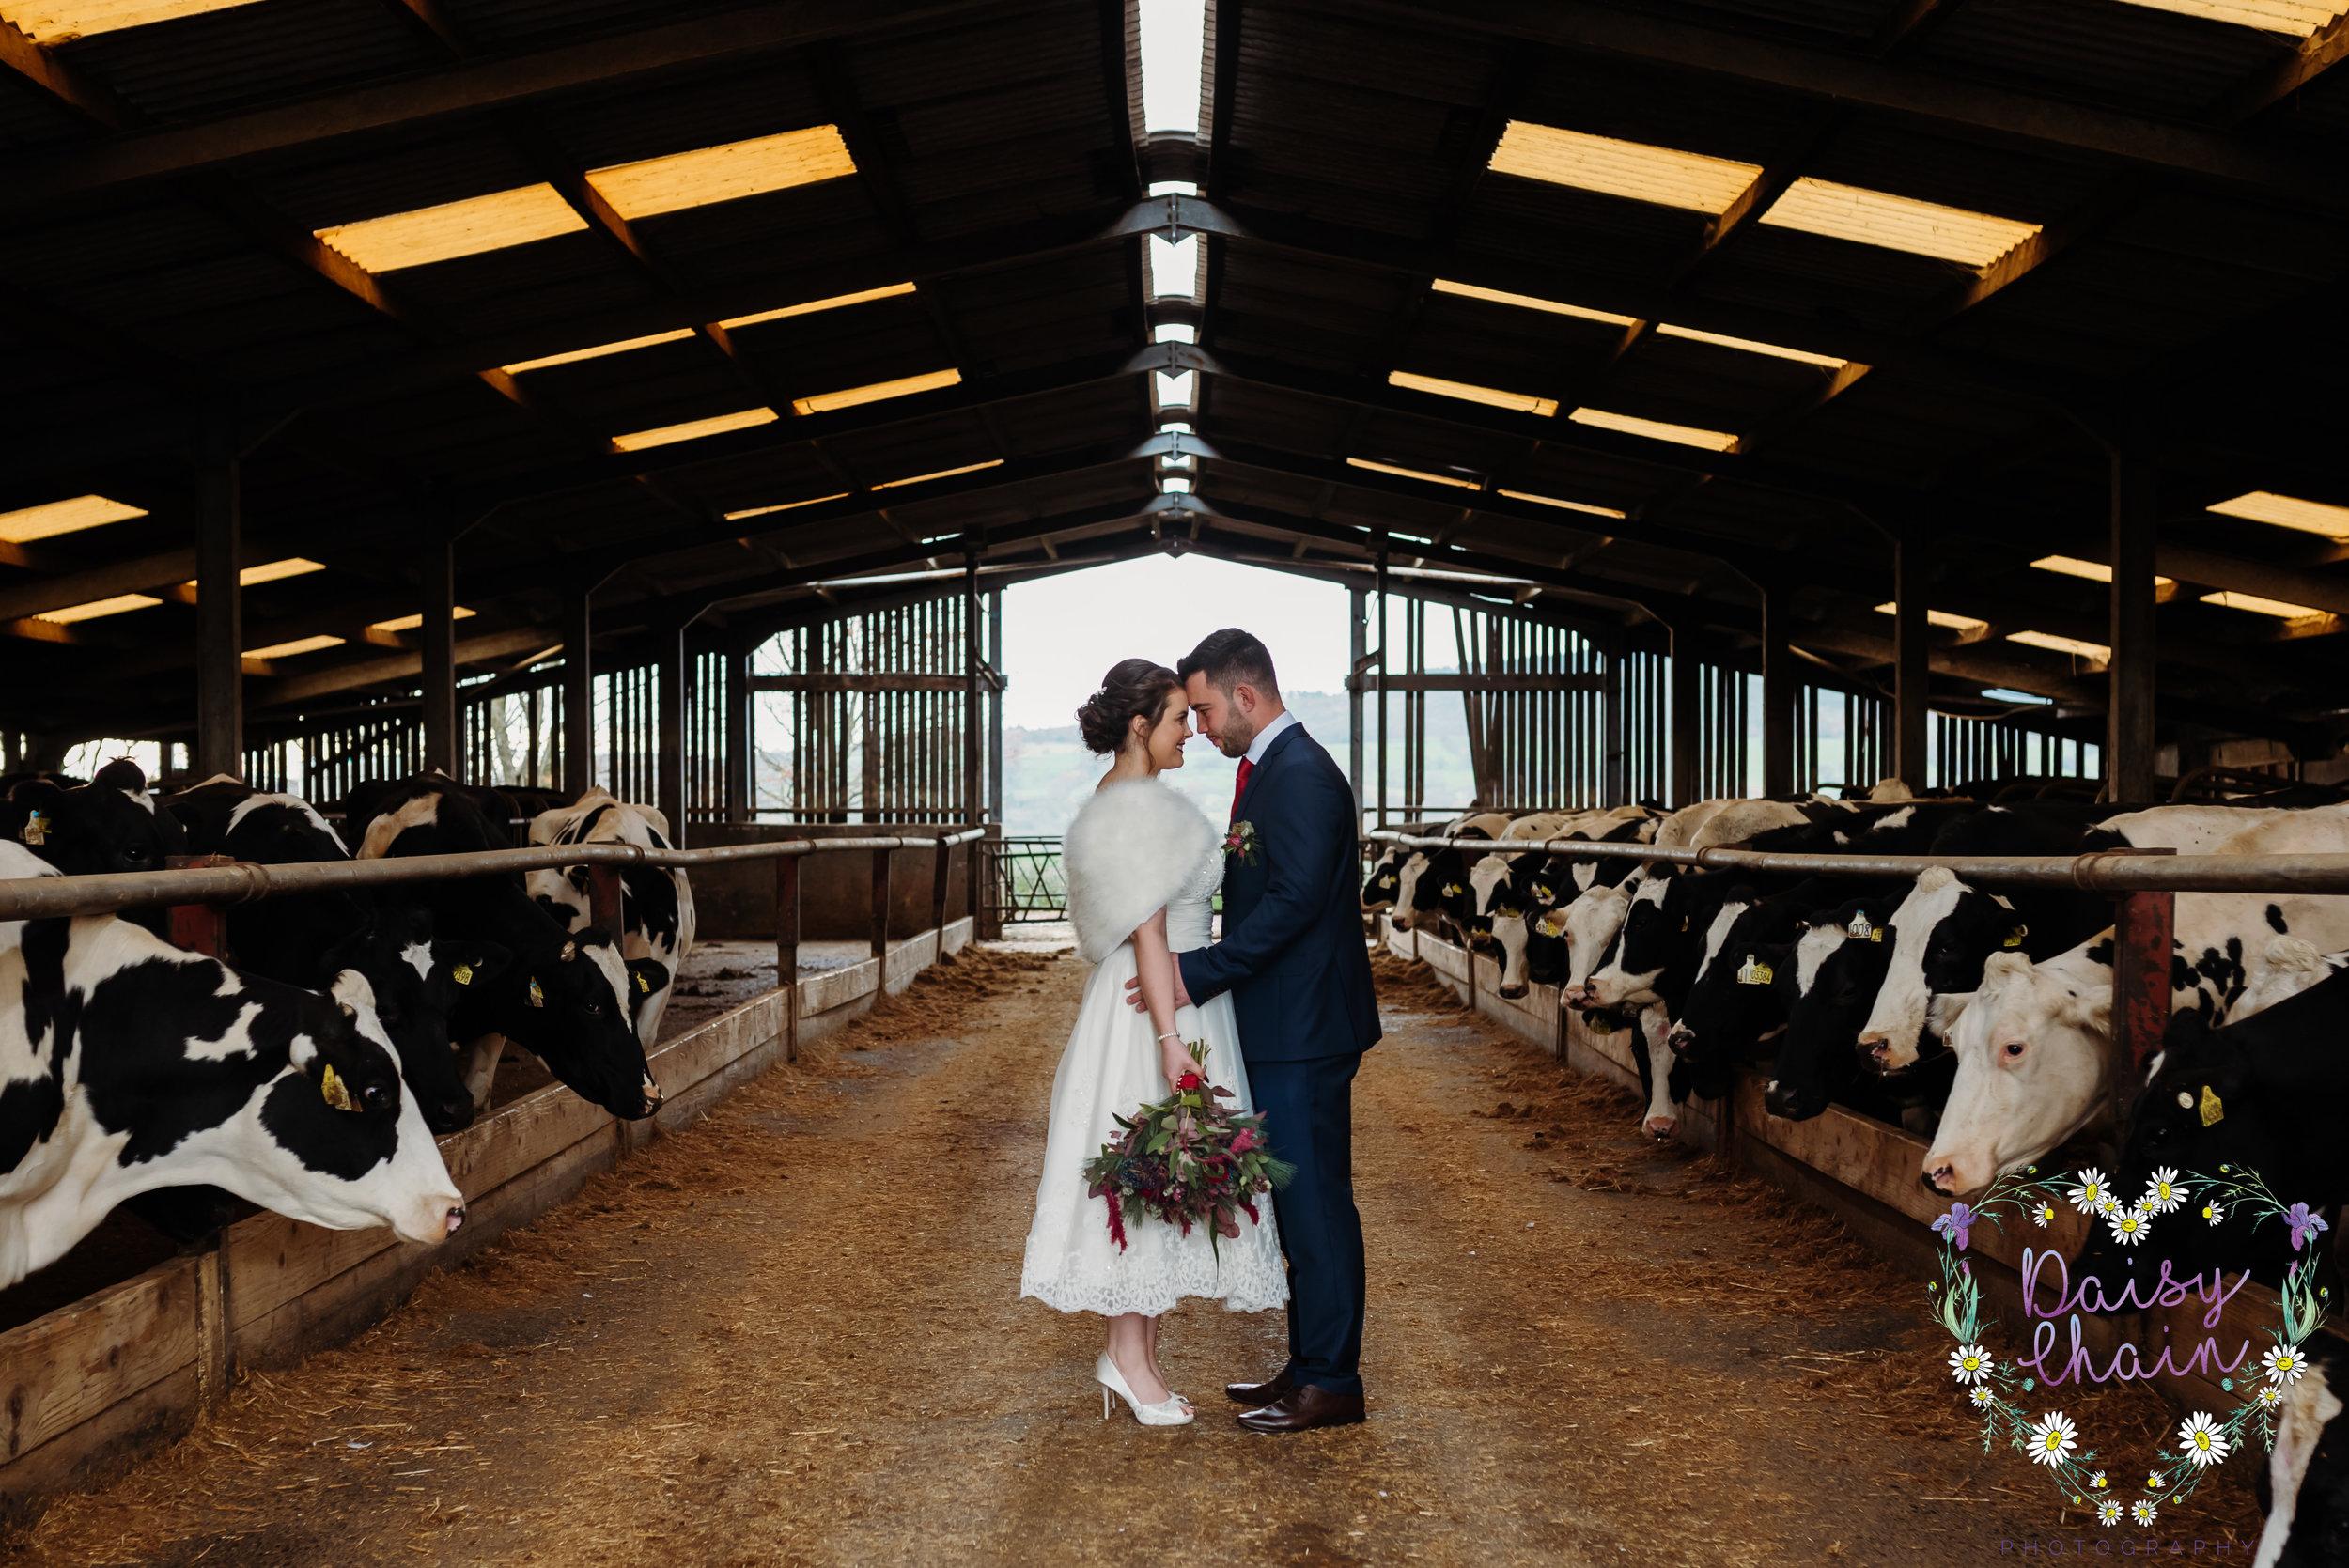 Bashall Barn, cow shed photograph